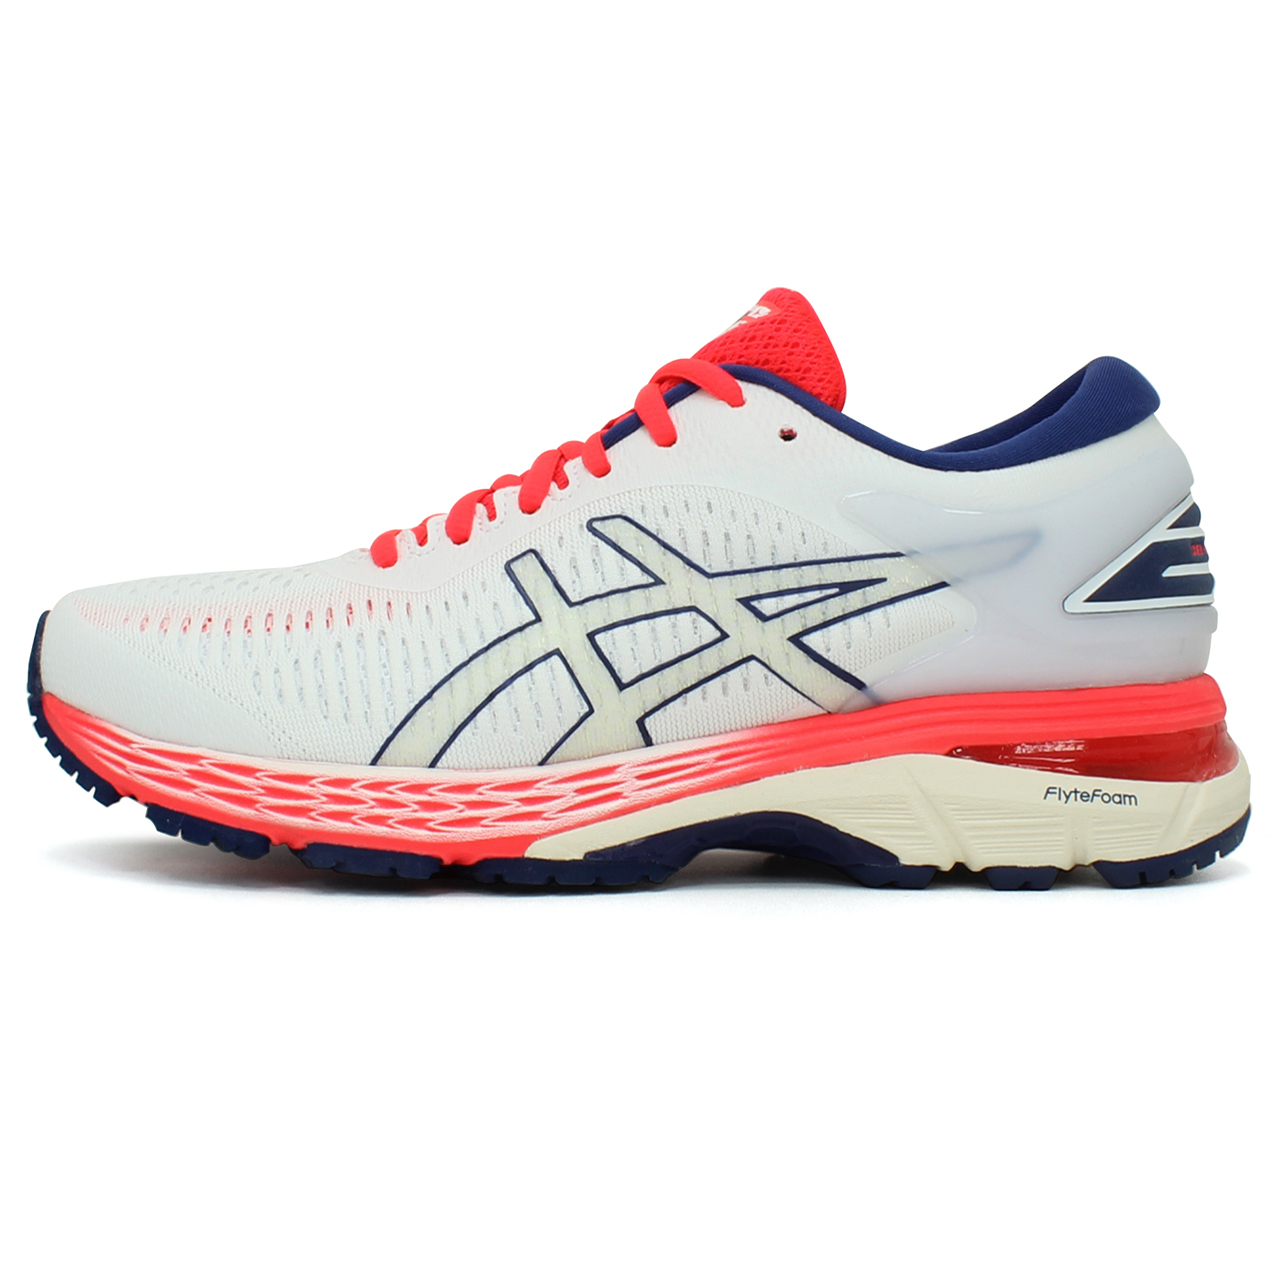 کفش مخصوص دویدن زنانه اسیکس مدل kayano کد 8734-079